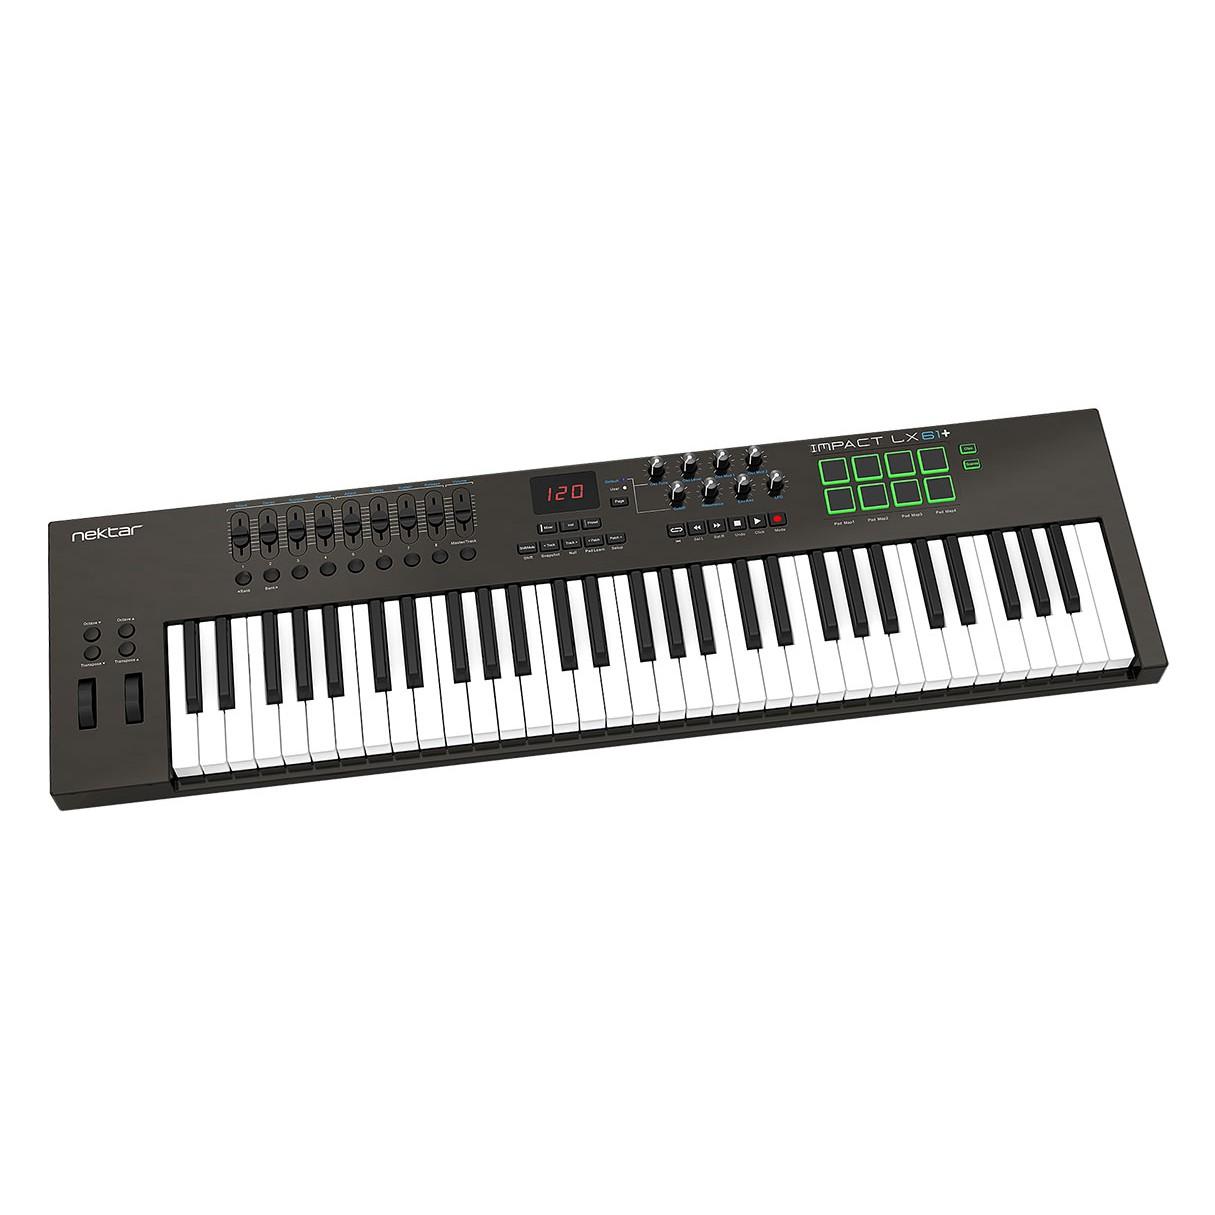 nektar impact lx61 61 key keyboard midi controller with built in daw integration. Black Bedroom Furniture Sets. Home Design Ideas